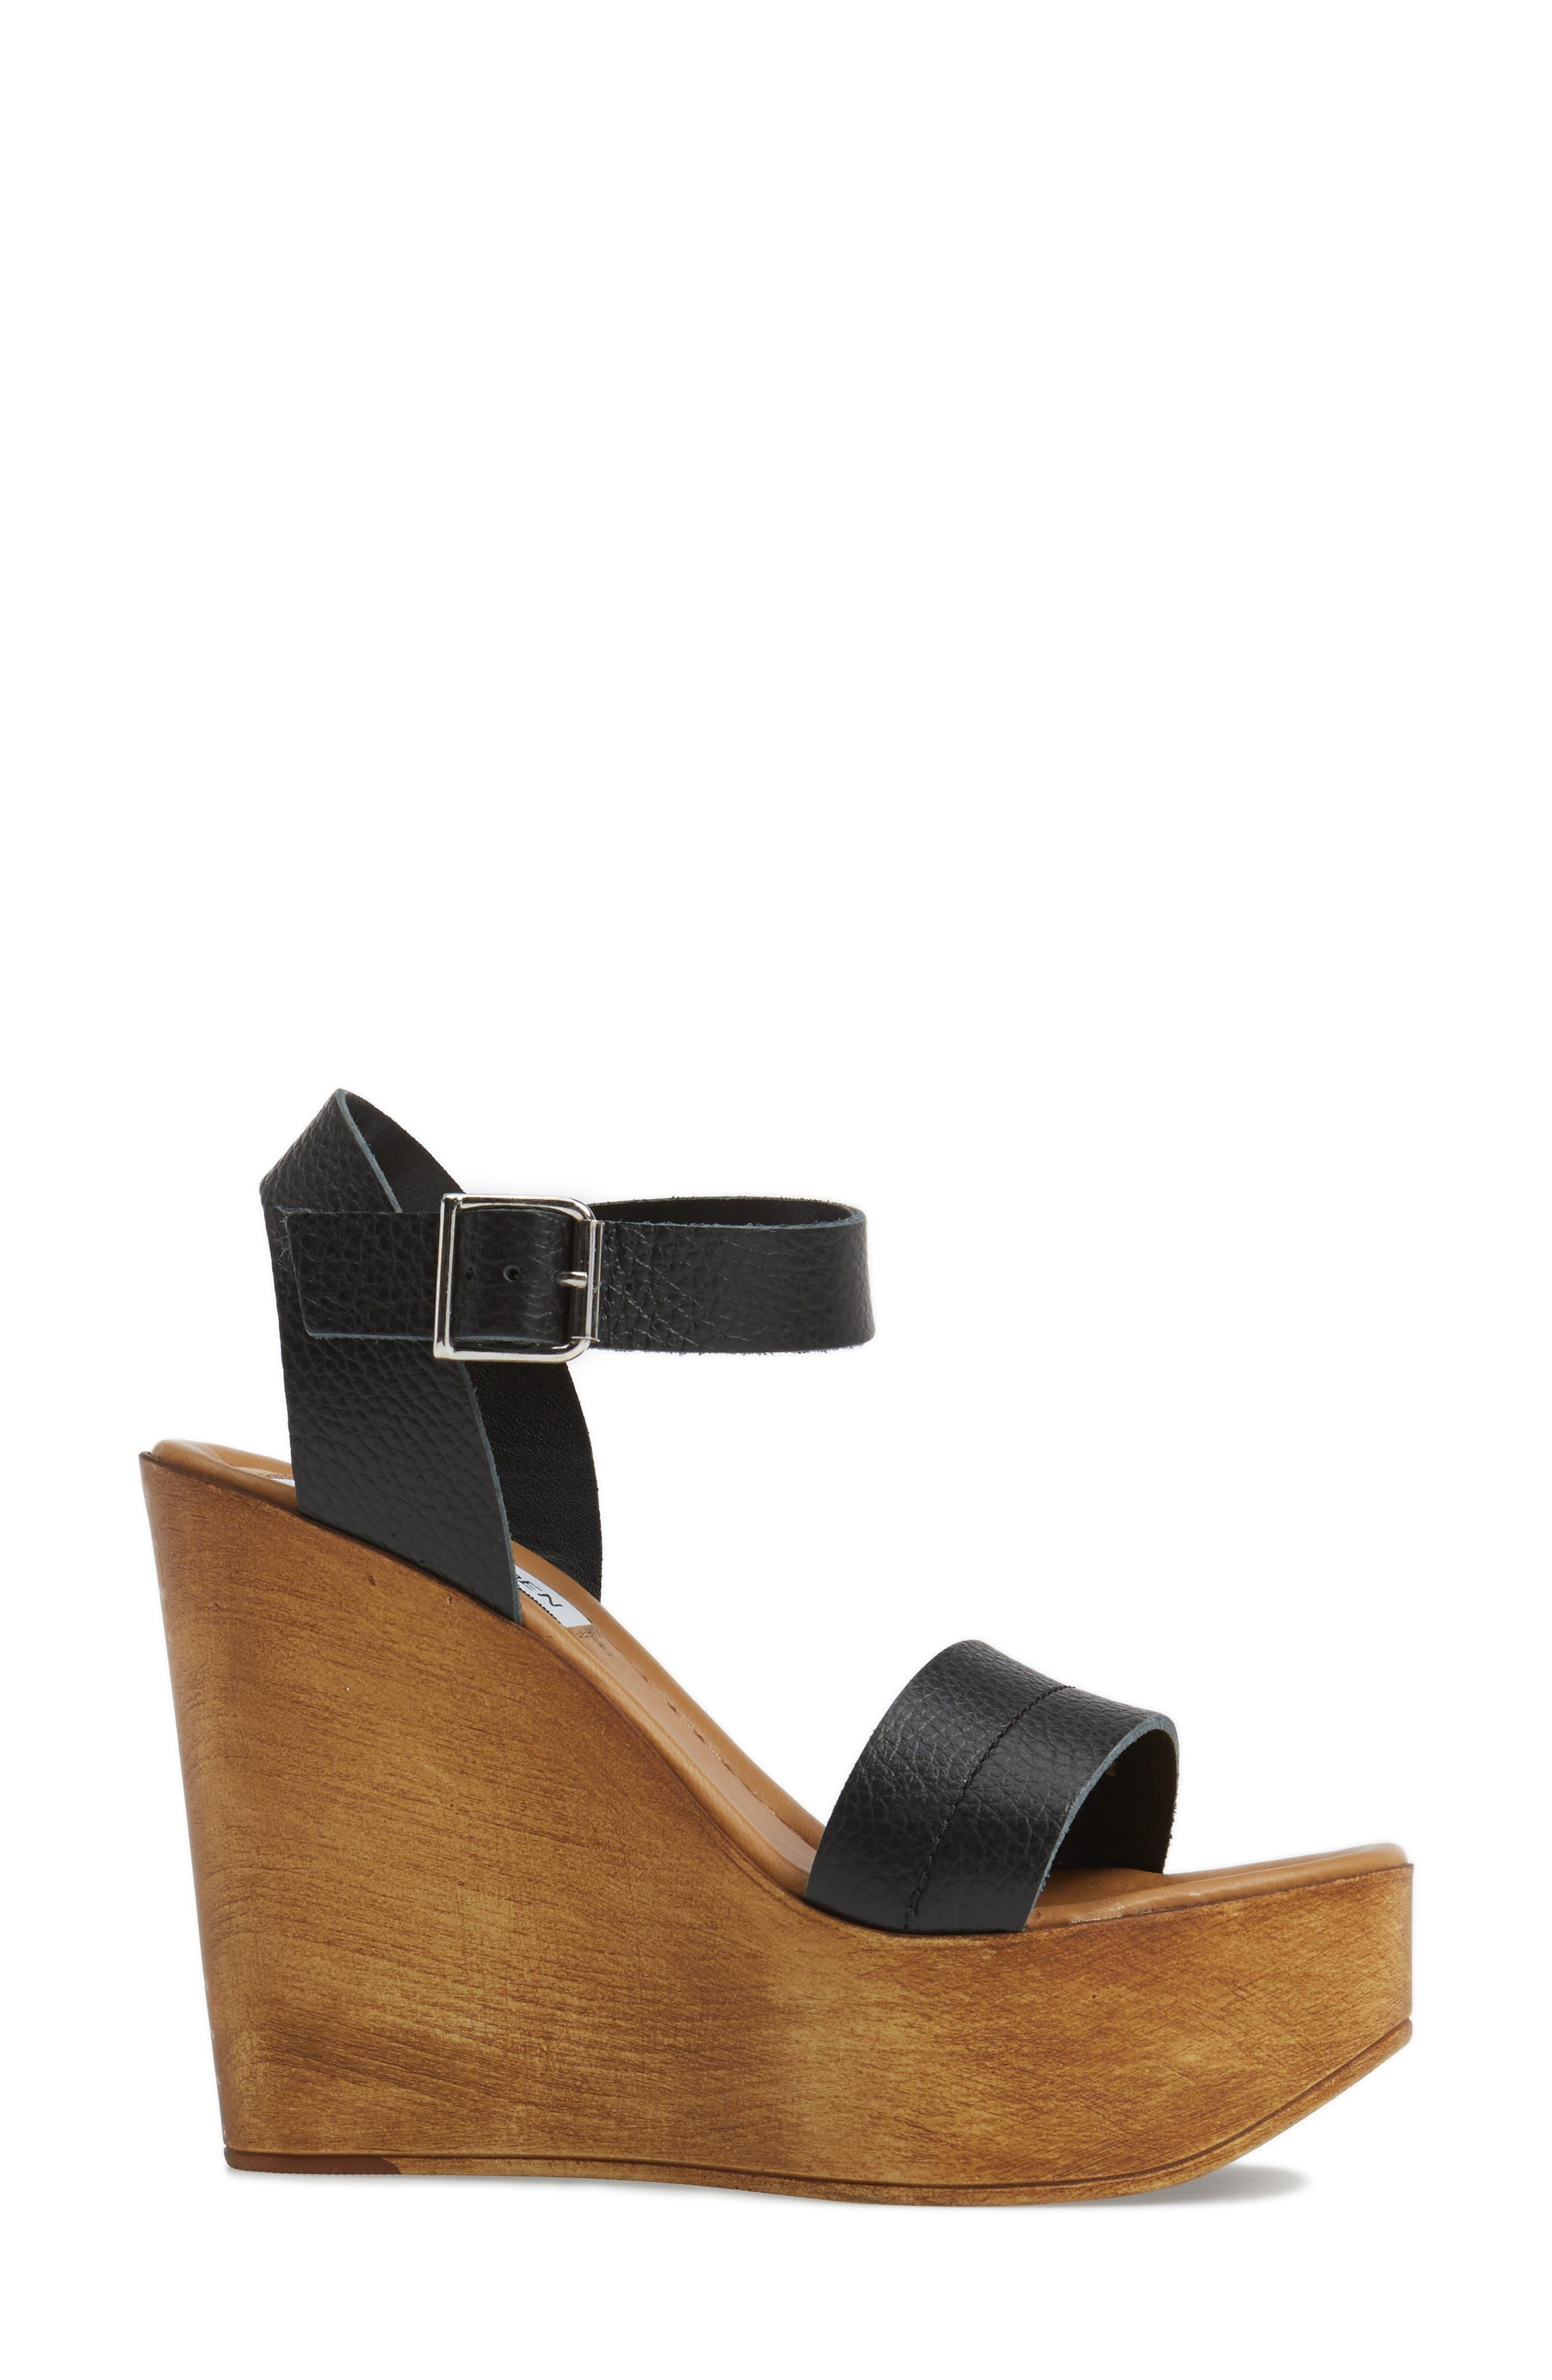 Belma Wedge Sandal,                             Alternate thumbnail 3, color,                             Black Leather